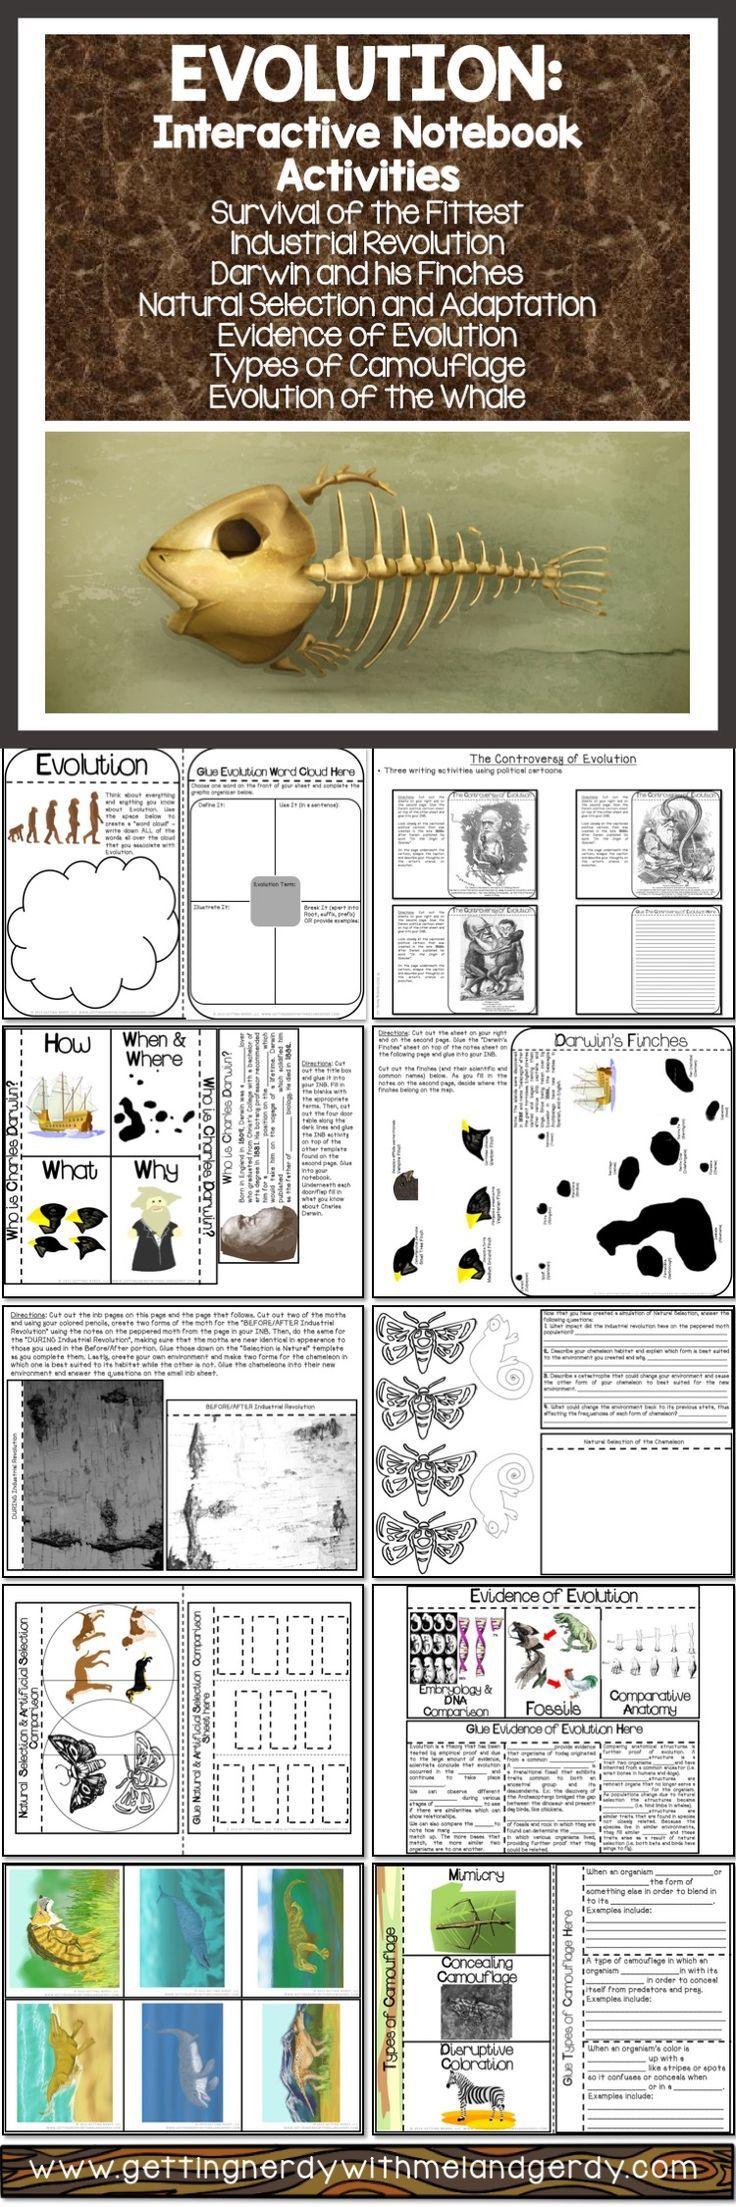 evolution interactive notebook natural selection moth and evolution. Black Bedroom Furniture Sets. Home Design Ideas